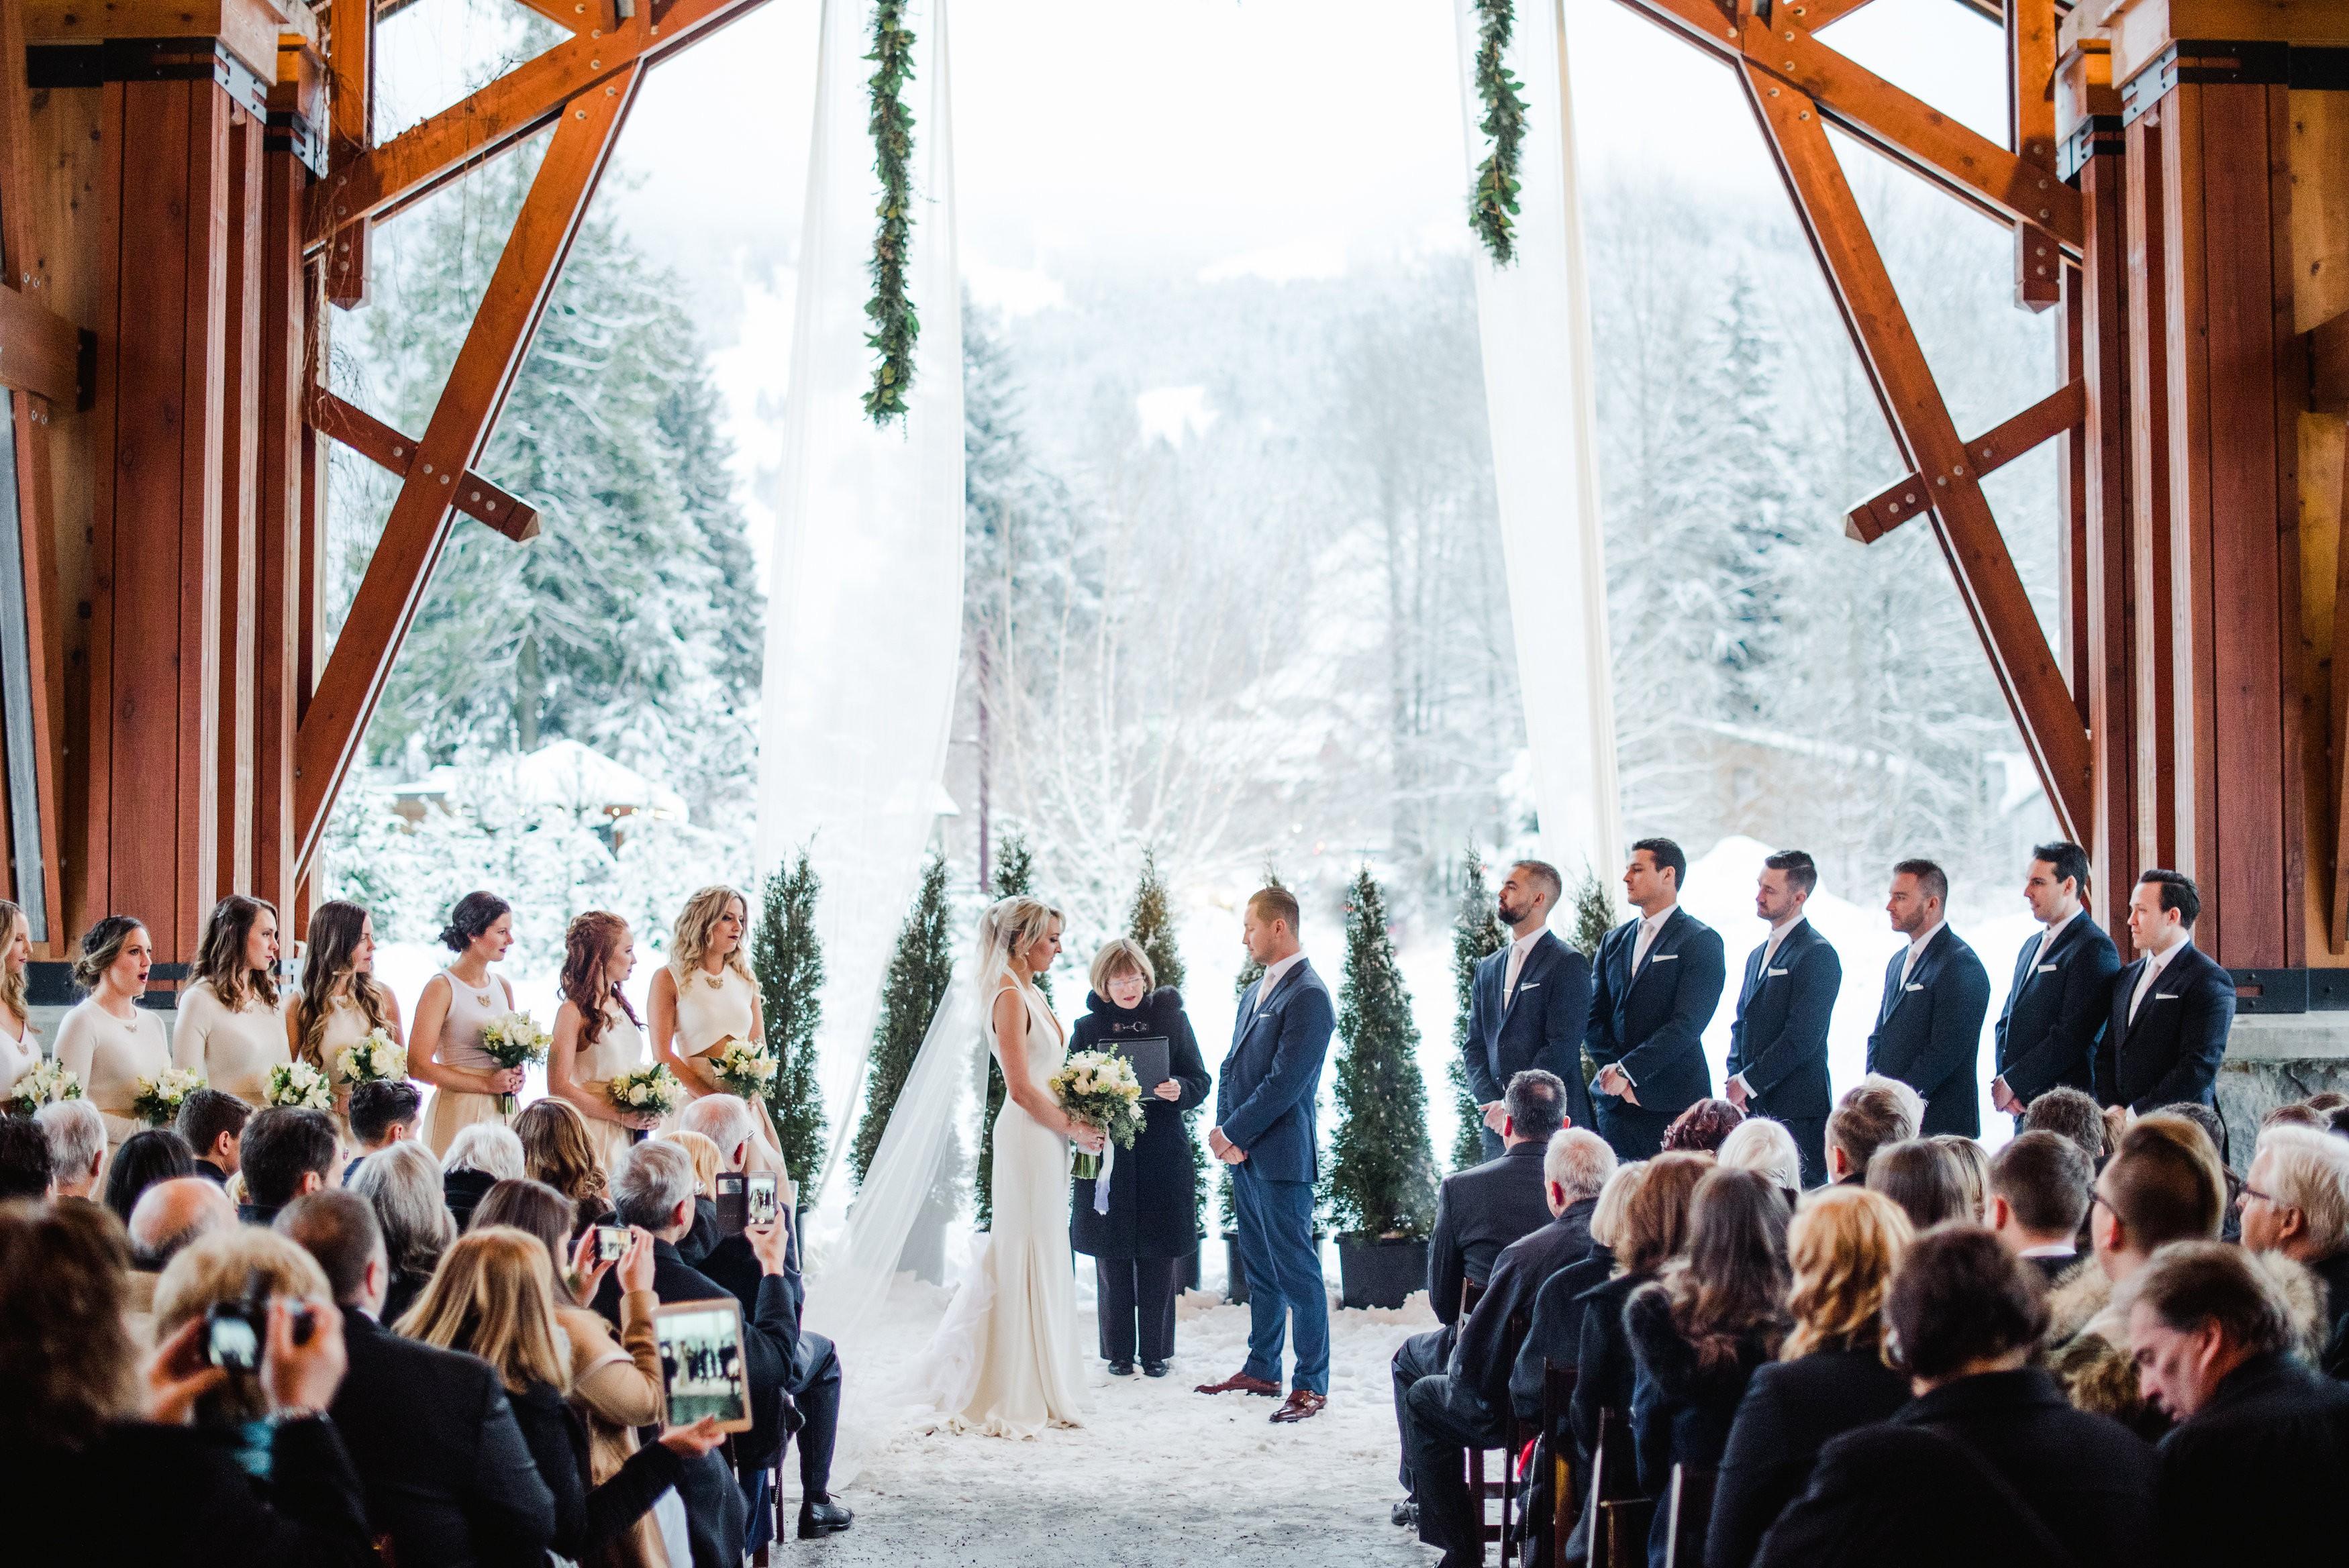 635c2ca4ca1 The Best Destination Wedding Venues in Canada